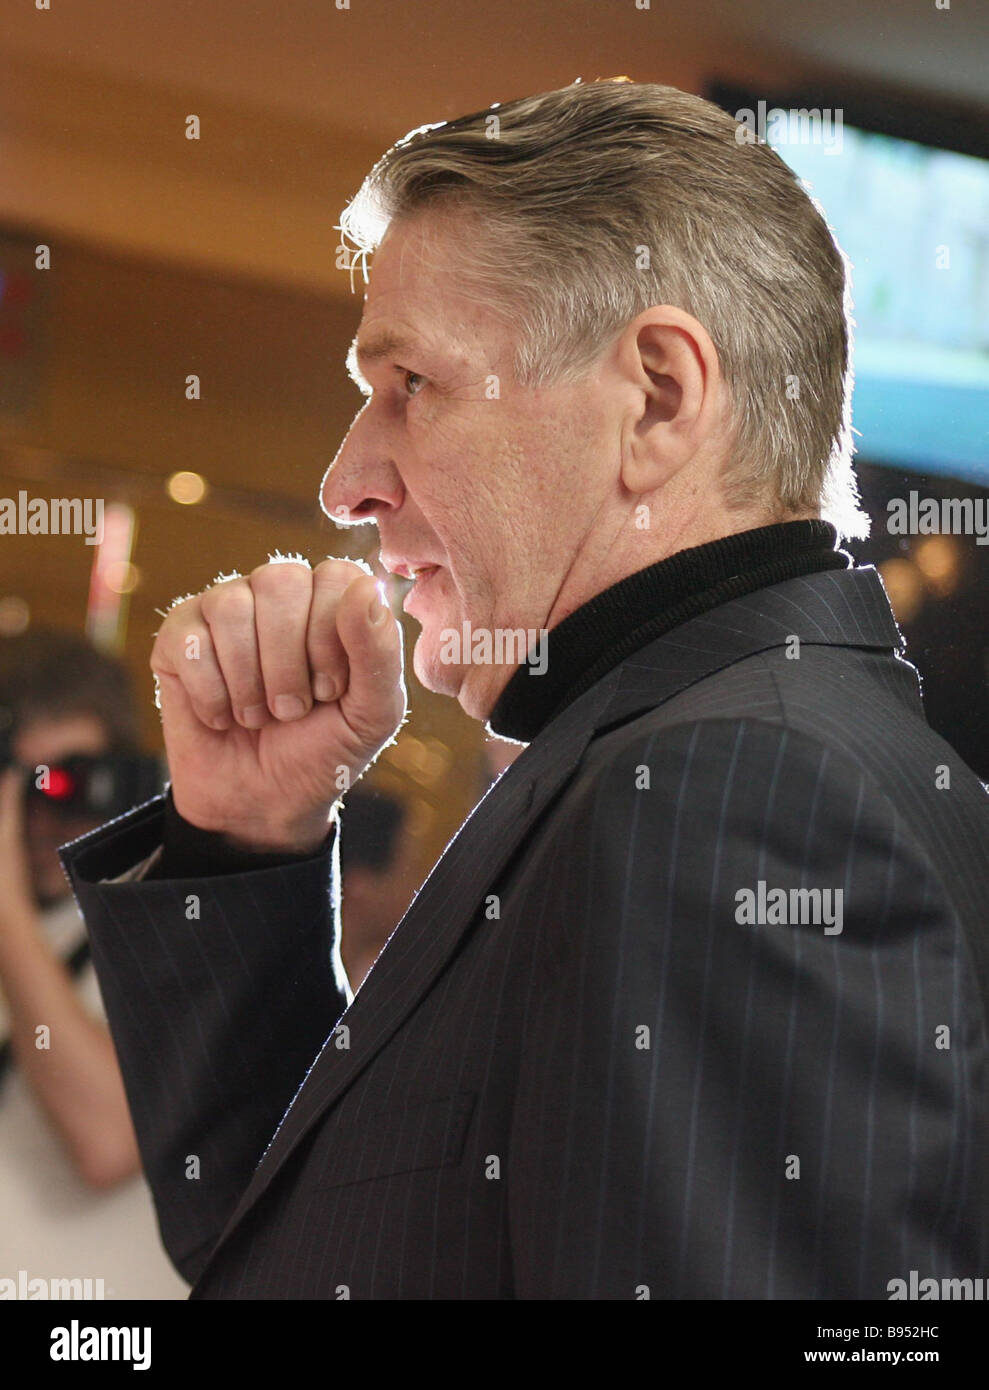 Actor Valery Nikolaev: filmography and biography. Best movies with Valery Nikolaev (photo)